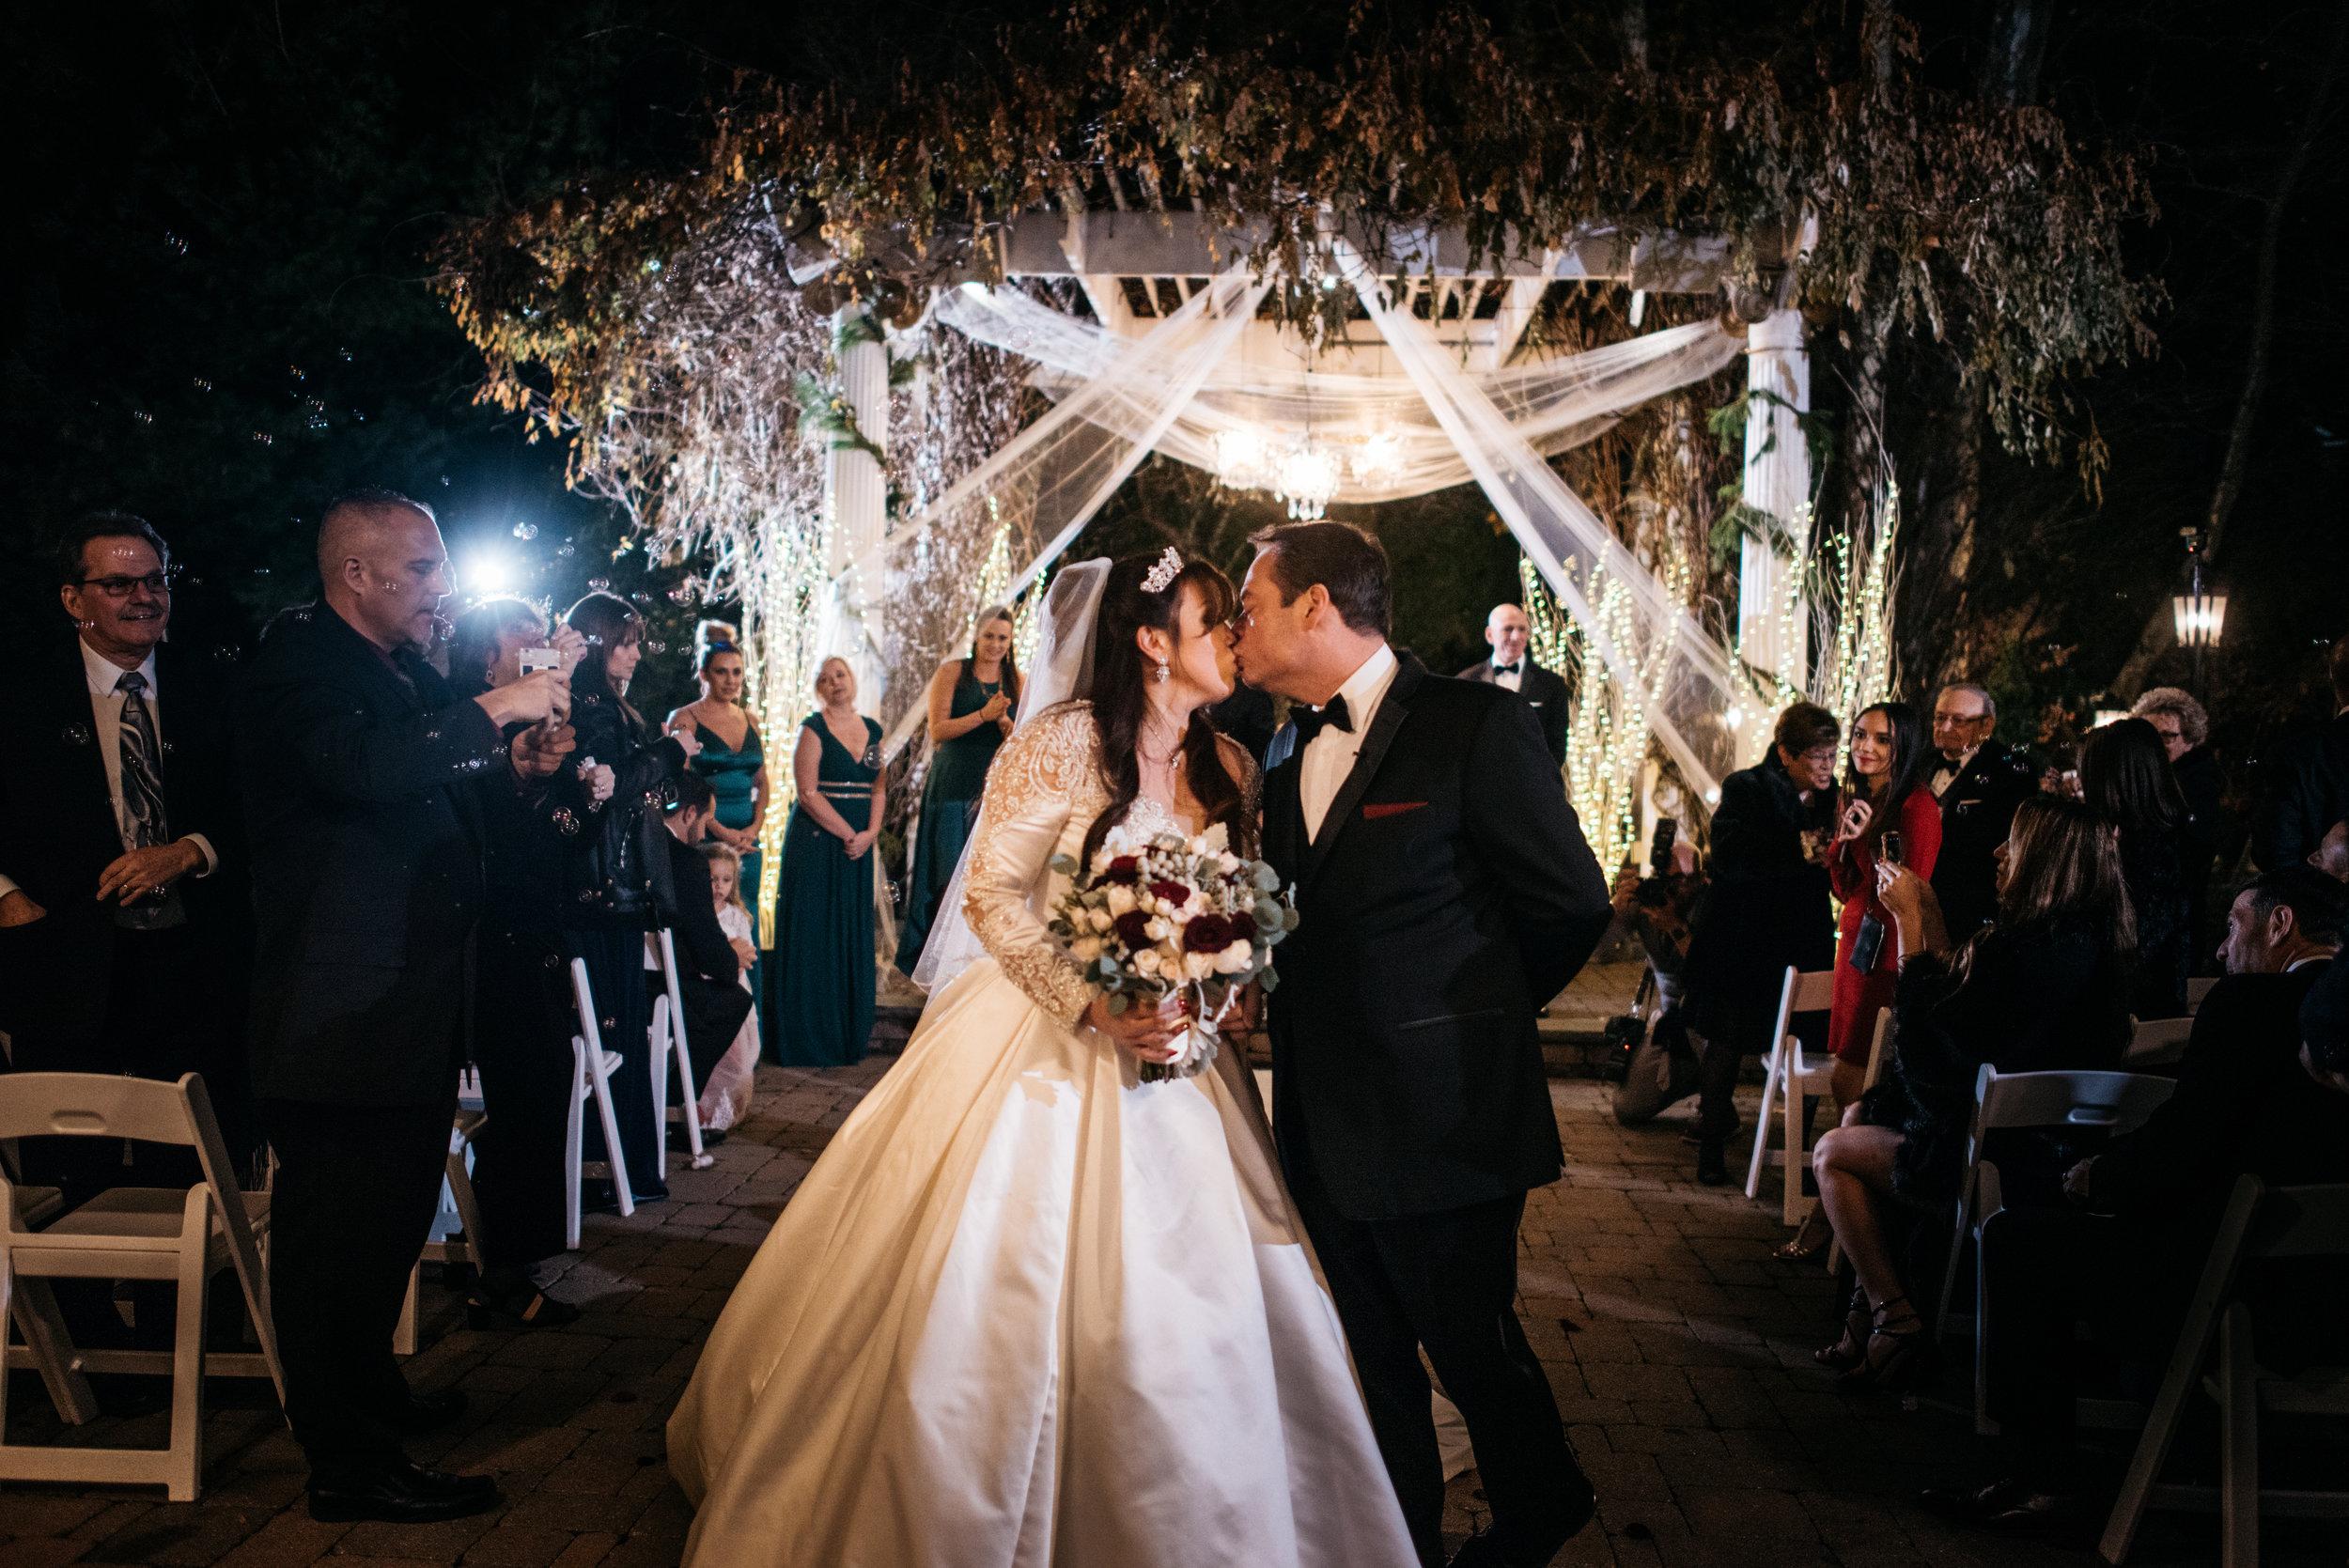 WeddingPhotos | NJPhotographer | Highlights-6-39.jpg